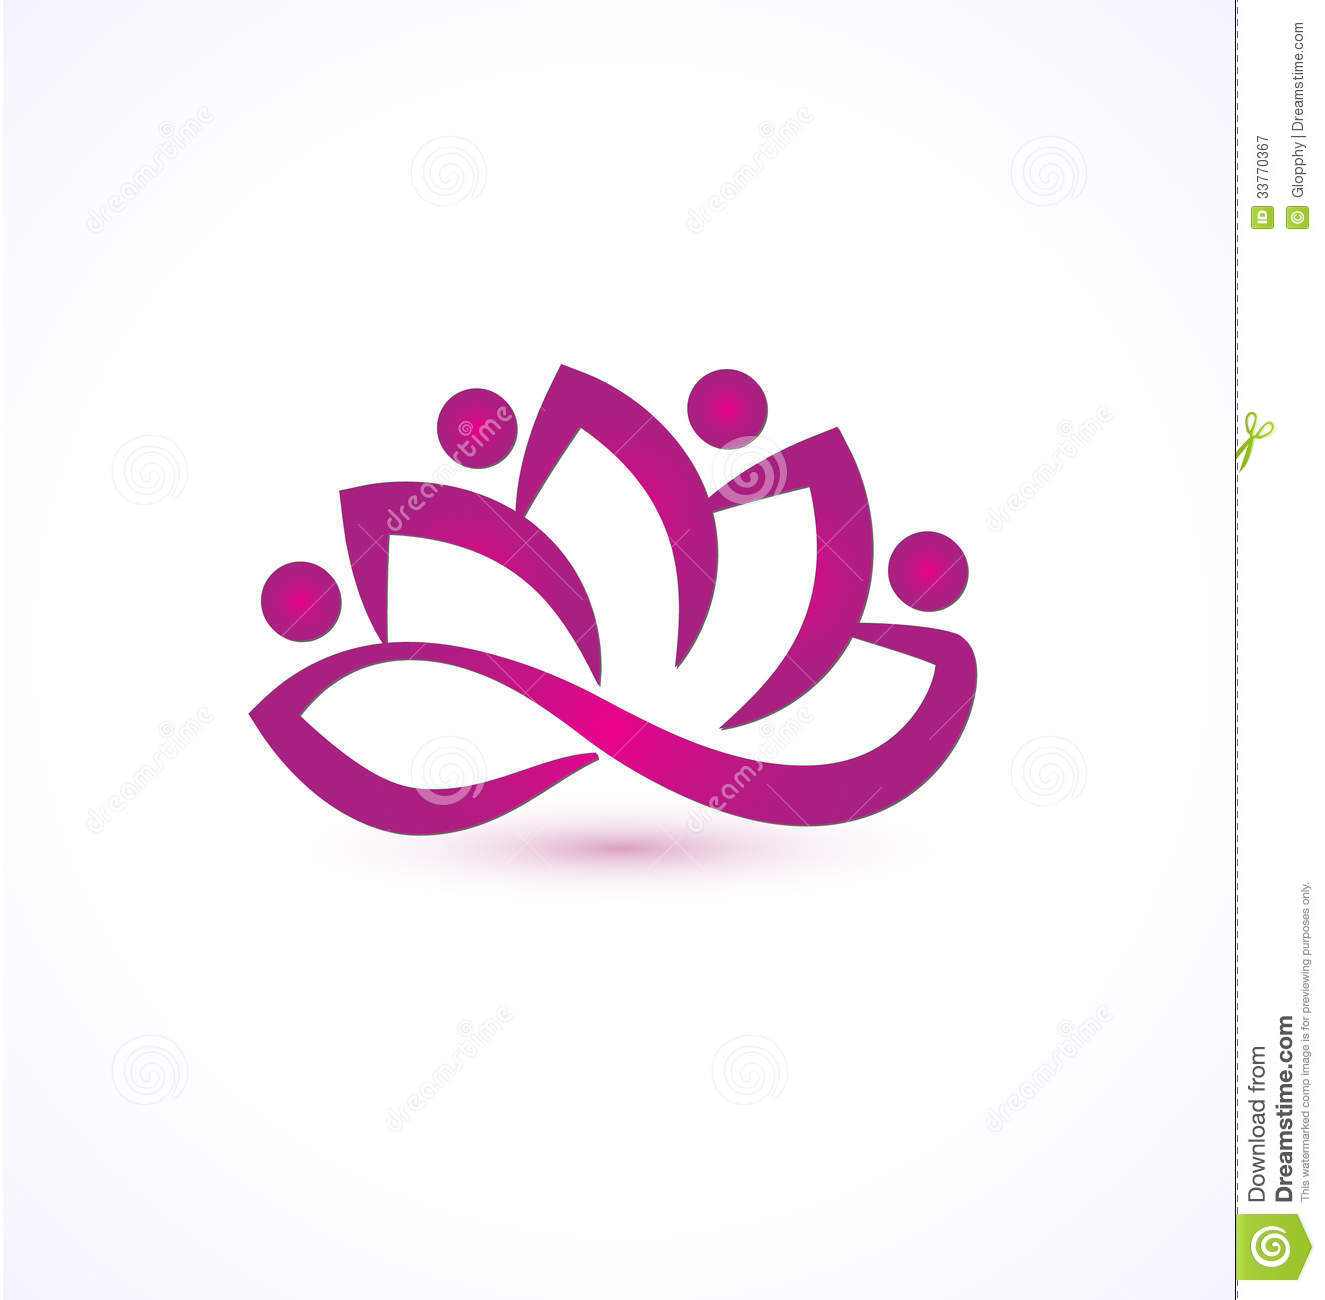 Lotus flower logos purple lotus flower logo royalty stock photography izmirmasajfo